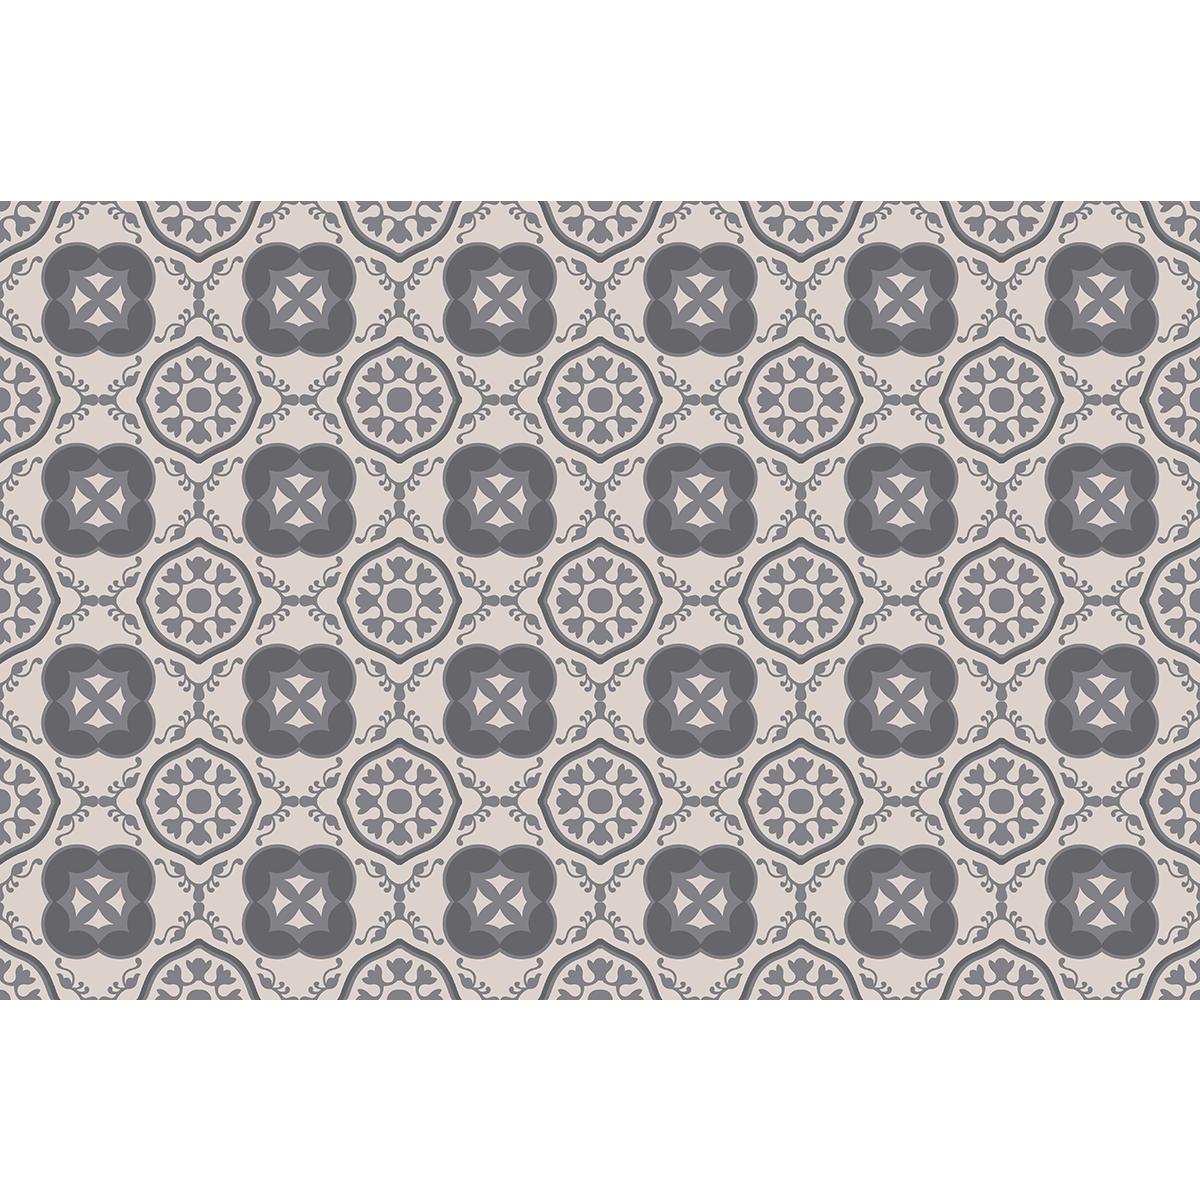 24 stickers carrelages azulejos antonino cuisine. Black Bedroom Furniture Sets. Home Design Ideas